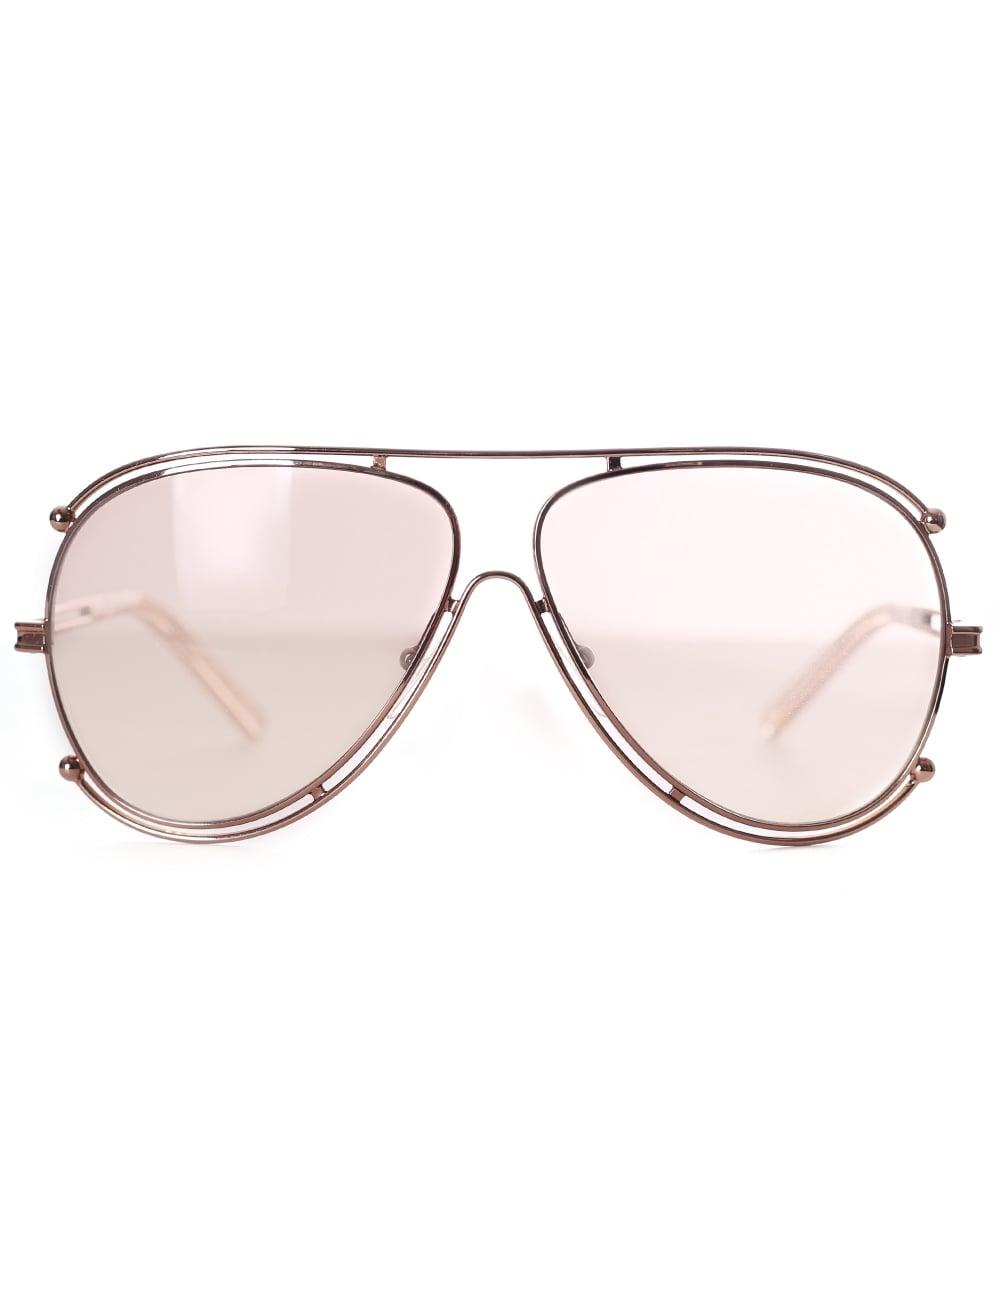 c58bdfd7 Women's CE121S Sunglasses